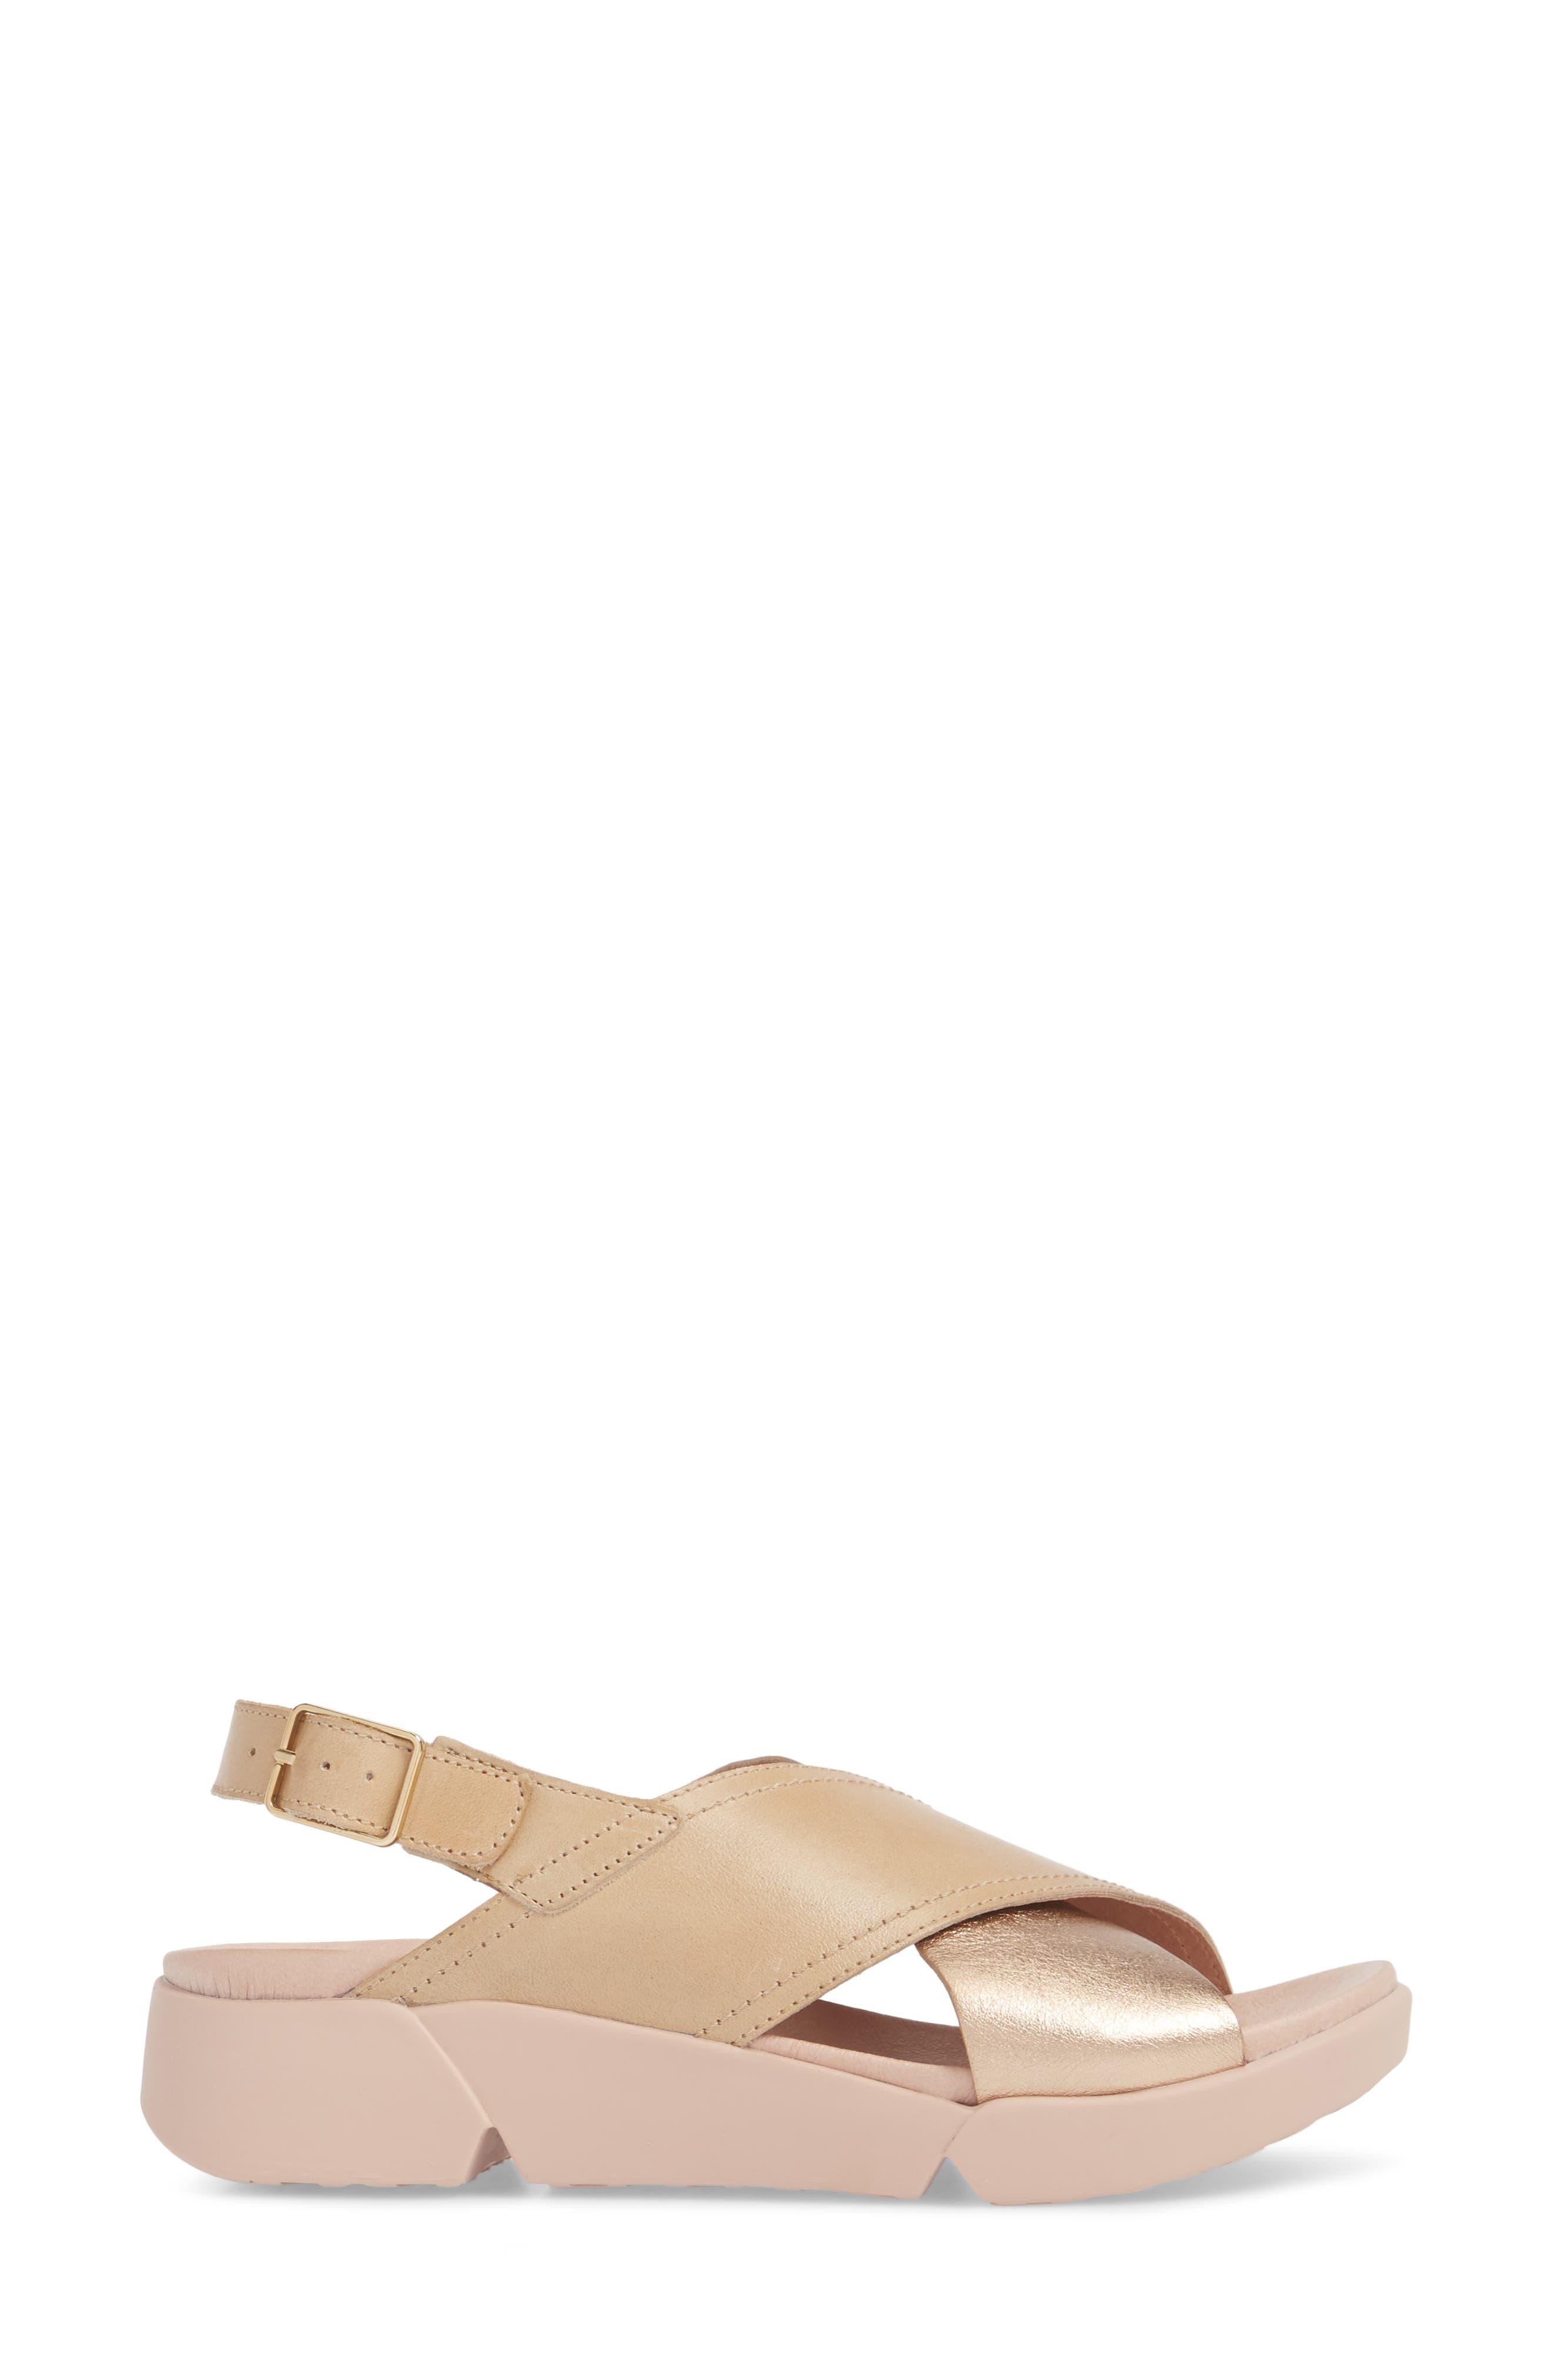 Platform Wedge Sandal,                             Alternate thumbnail 3, color,                             Oro/ Taupe Leather